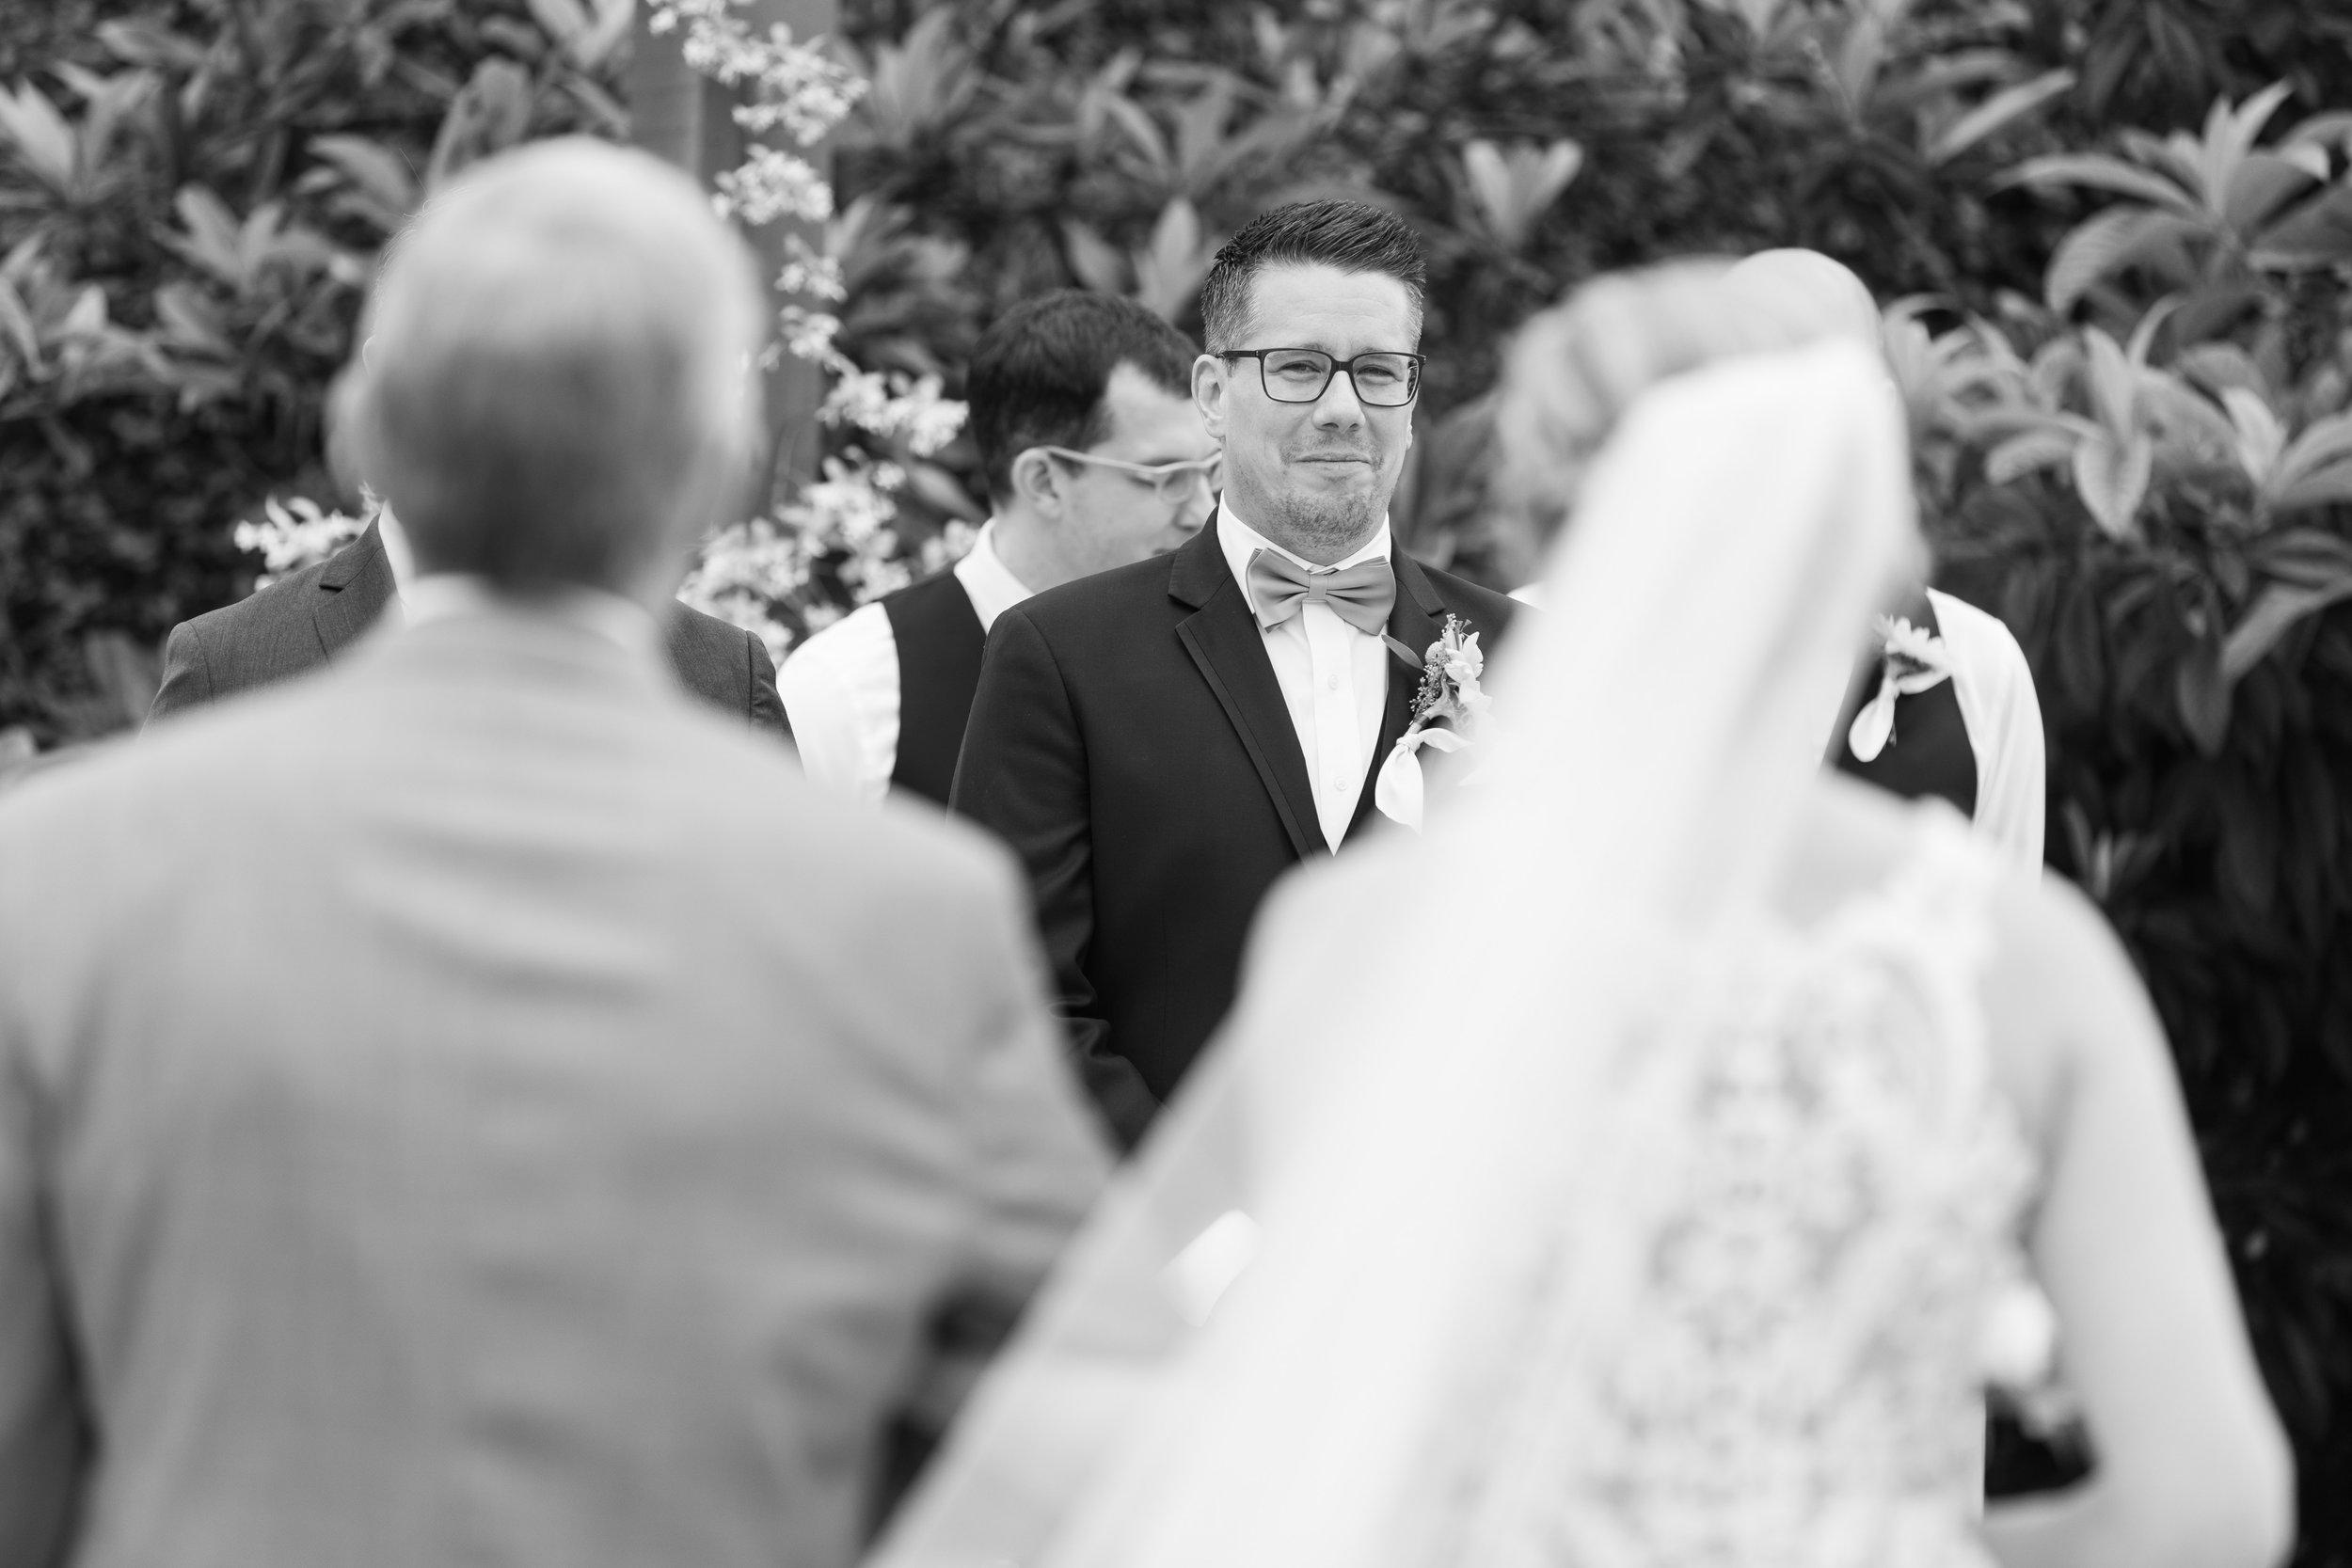 Laufs-Wedding-356.jpg